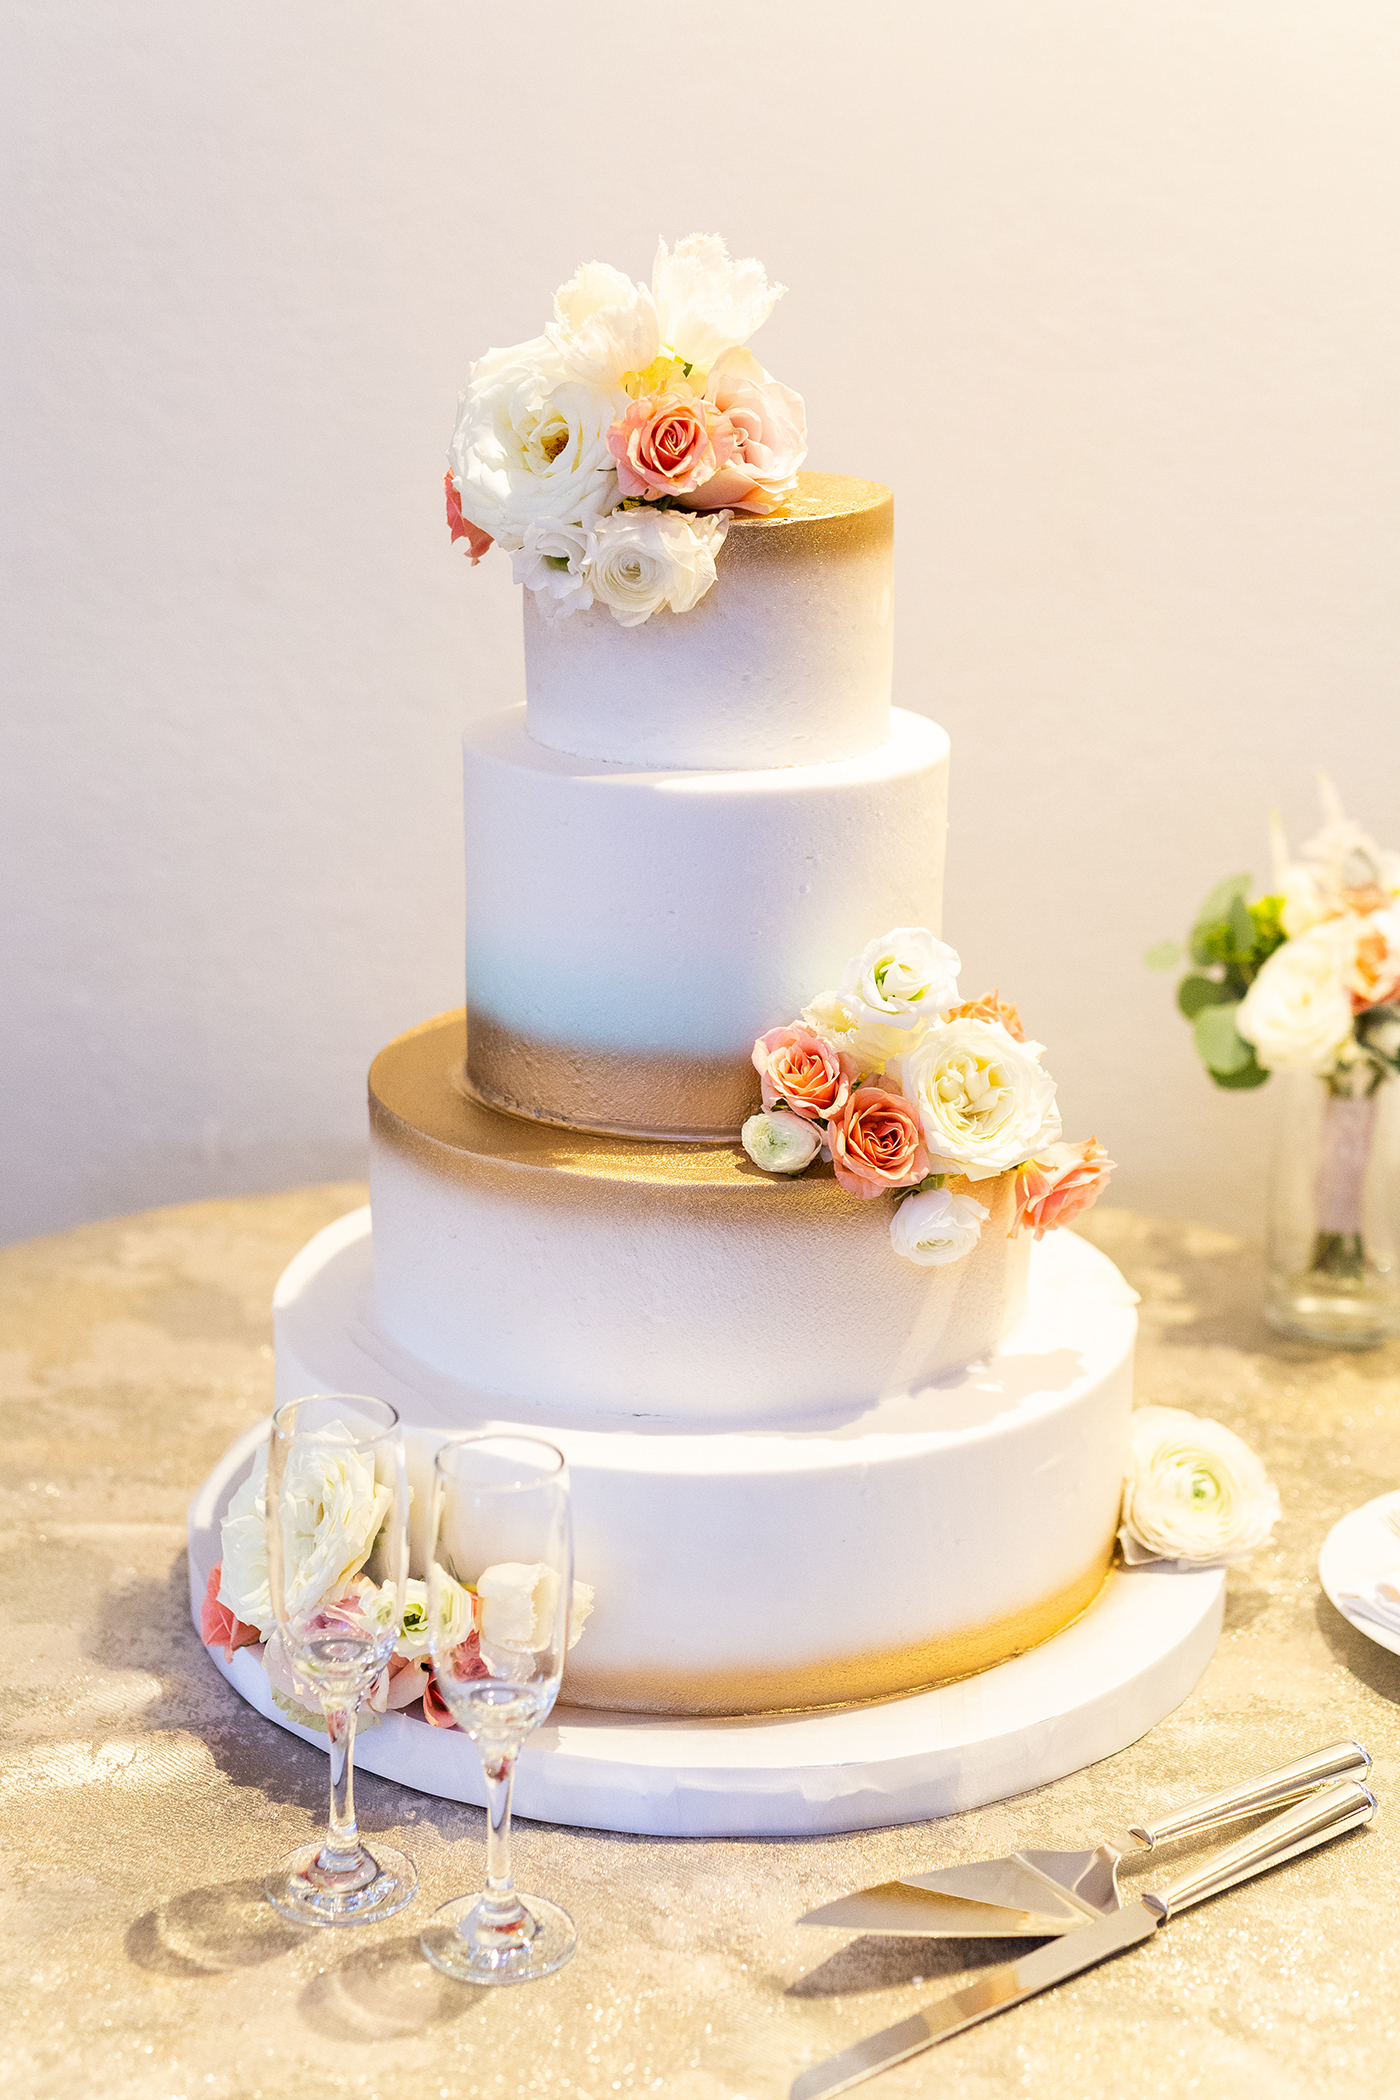 DFW Wedding Planner - Caroline + Jeff at The Four Seasons Hotel Wedding - Allday Events - 149.jpg